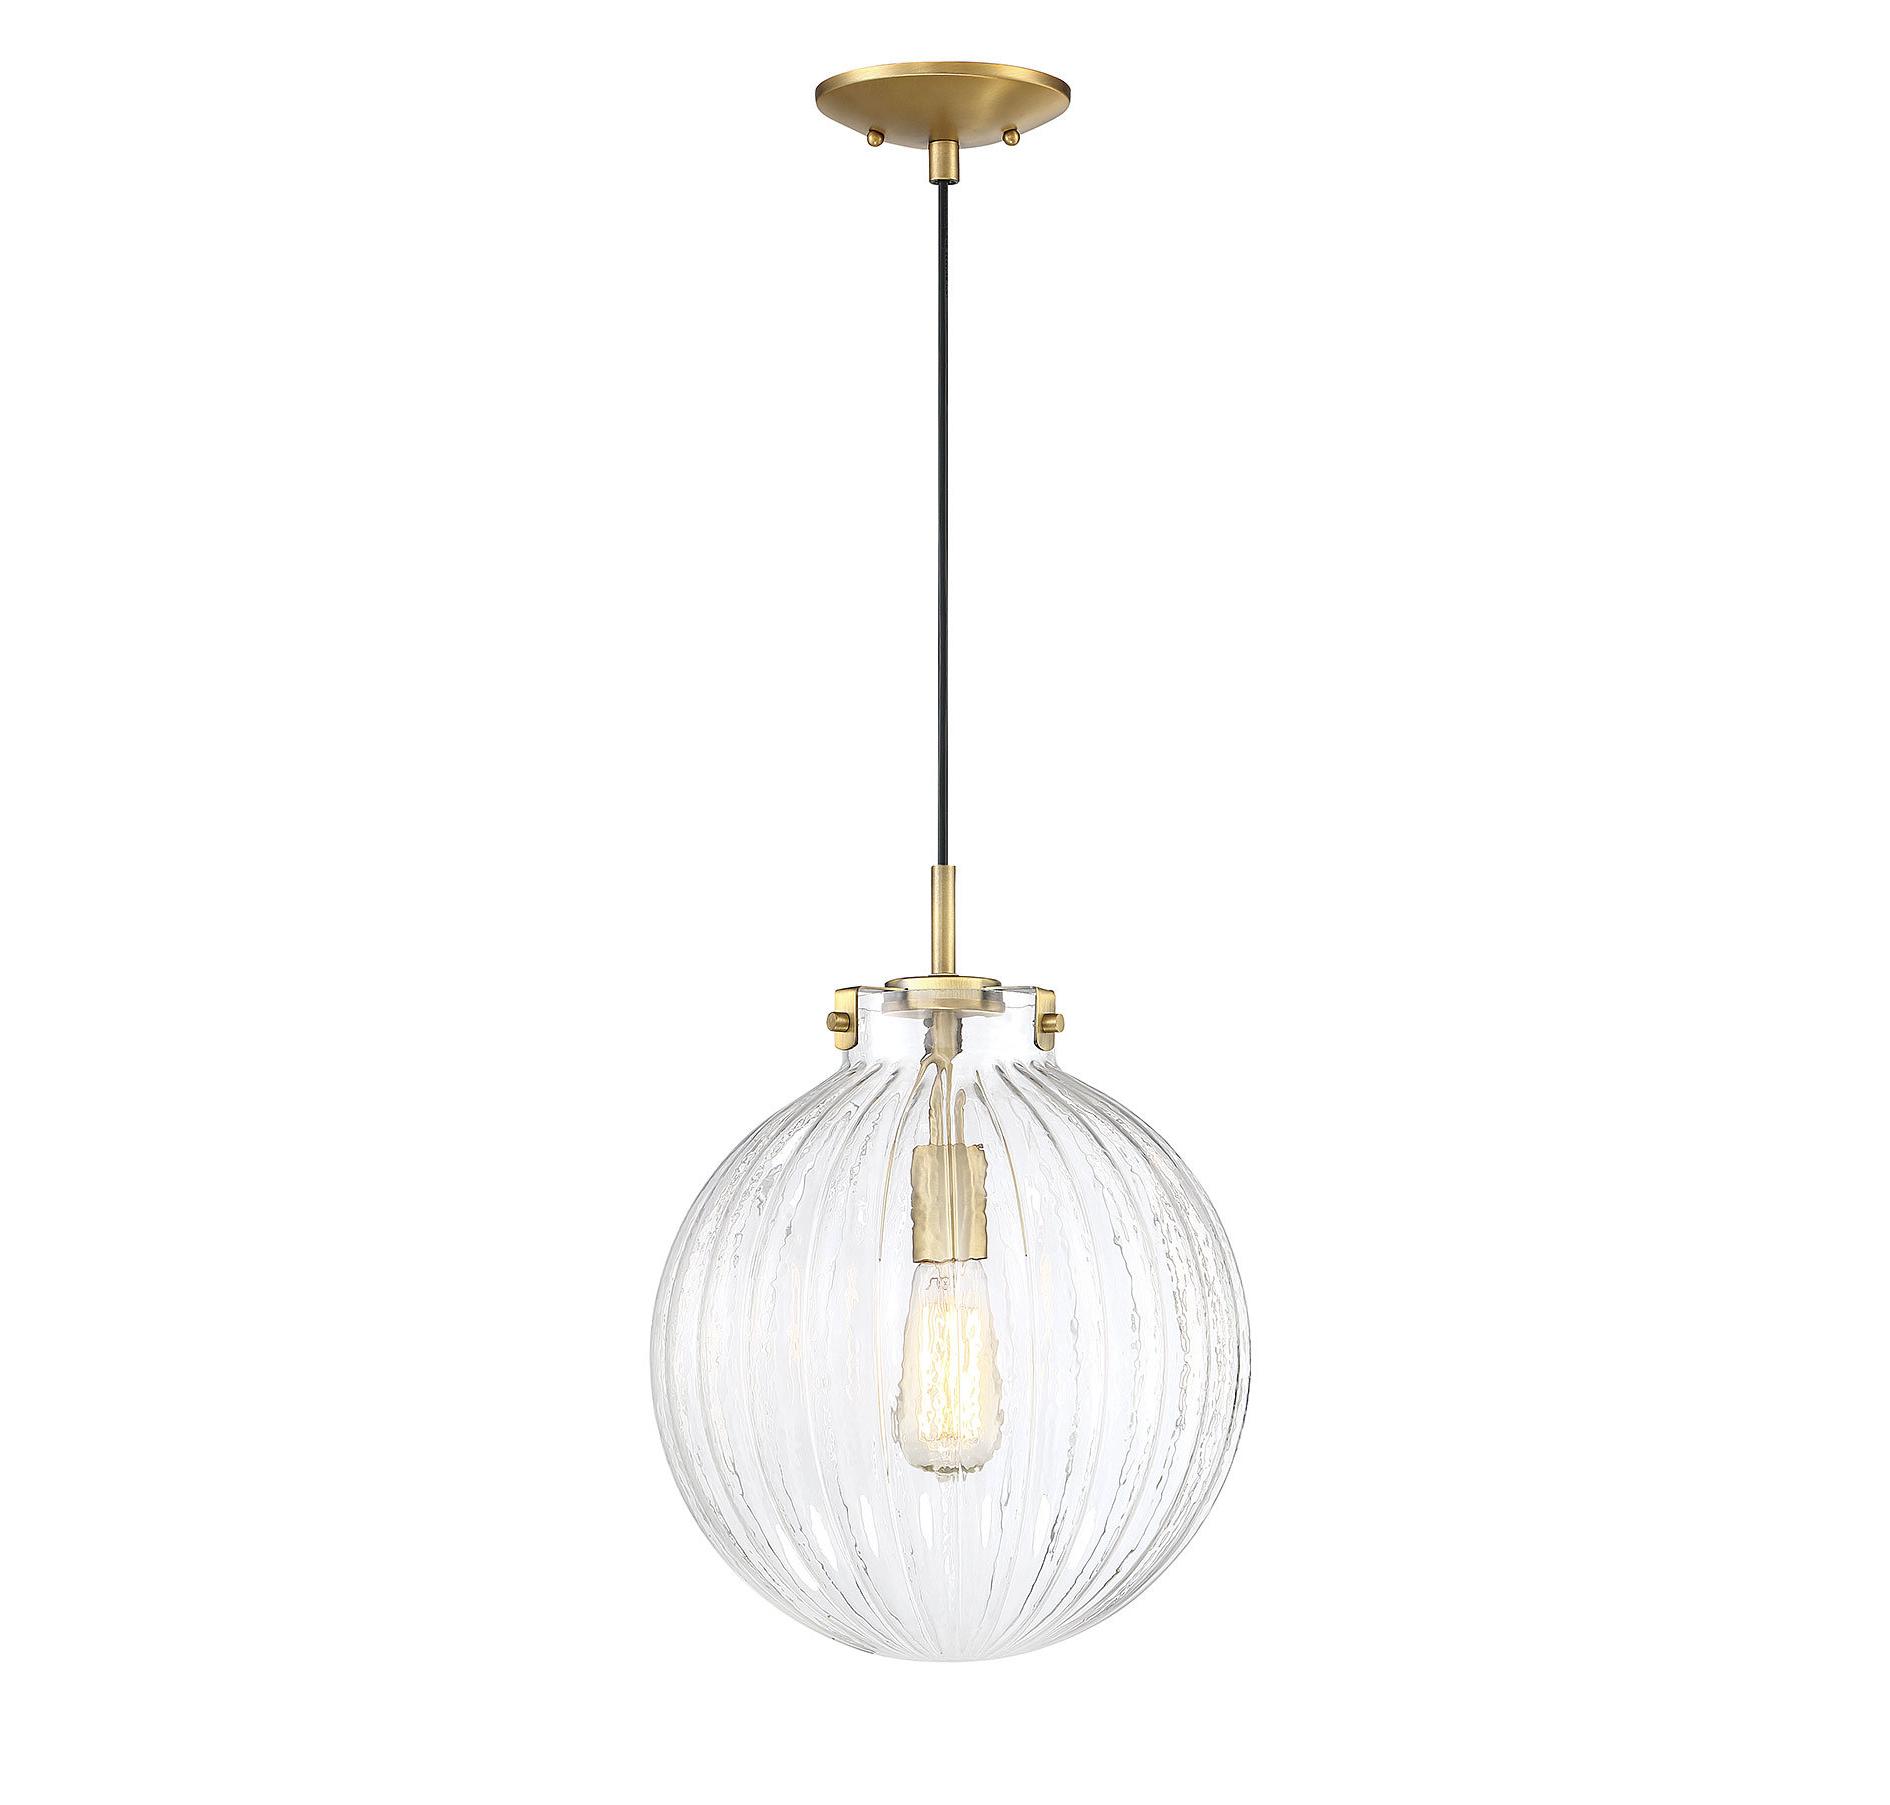 Nevels 1-Light Single Globe Pendant with regard to Most Current 1-Light Globe Pendants